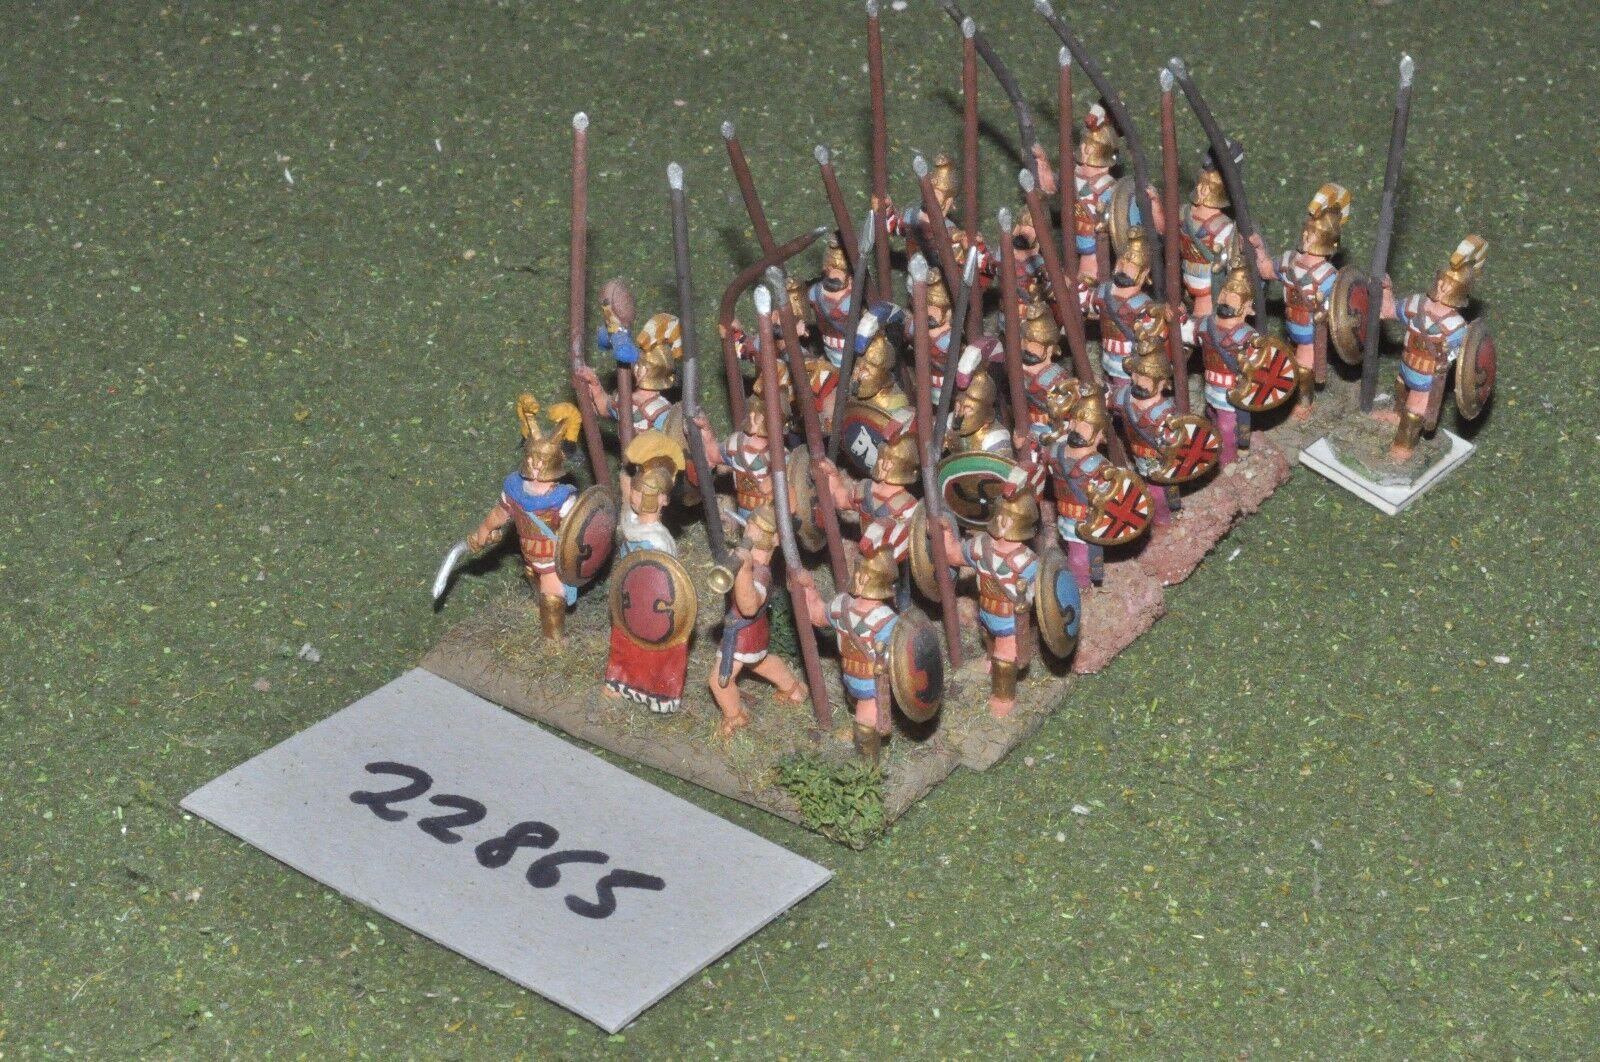 25mm Clásico macedonio-pikemen 24 figuras-INF (22865)